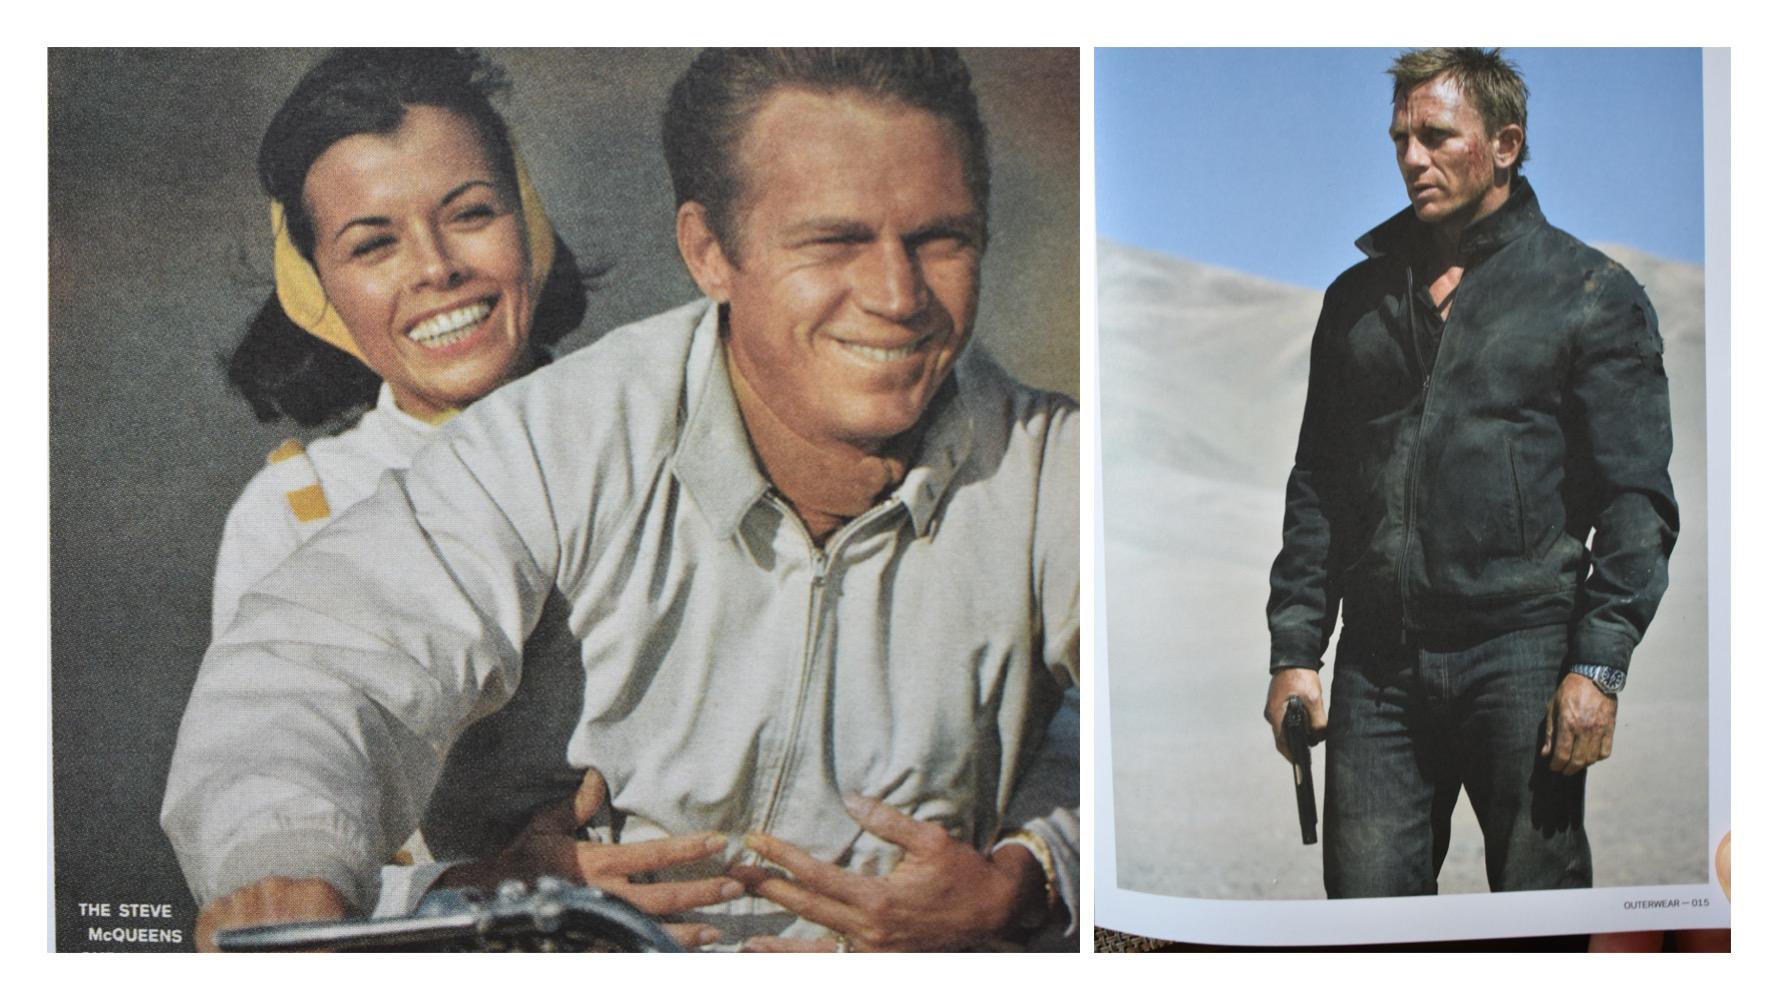 Steve McQueen and Daniel Craig Baracuta